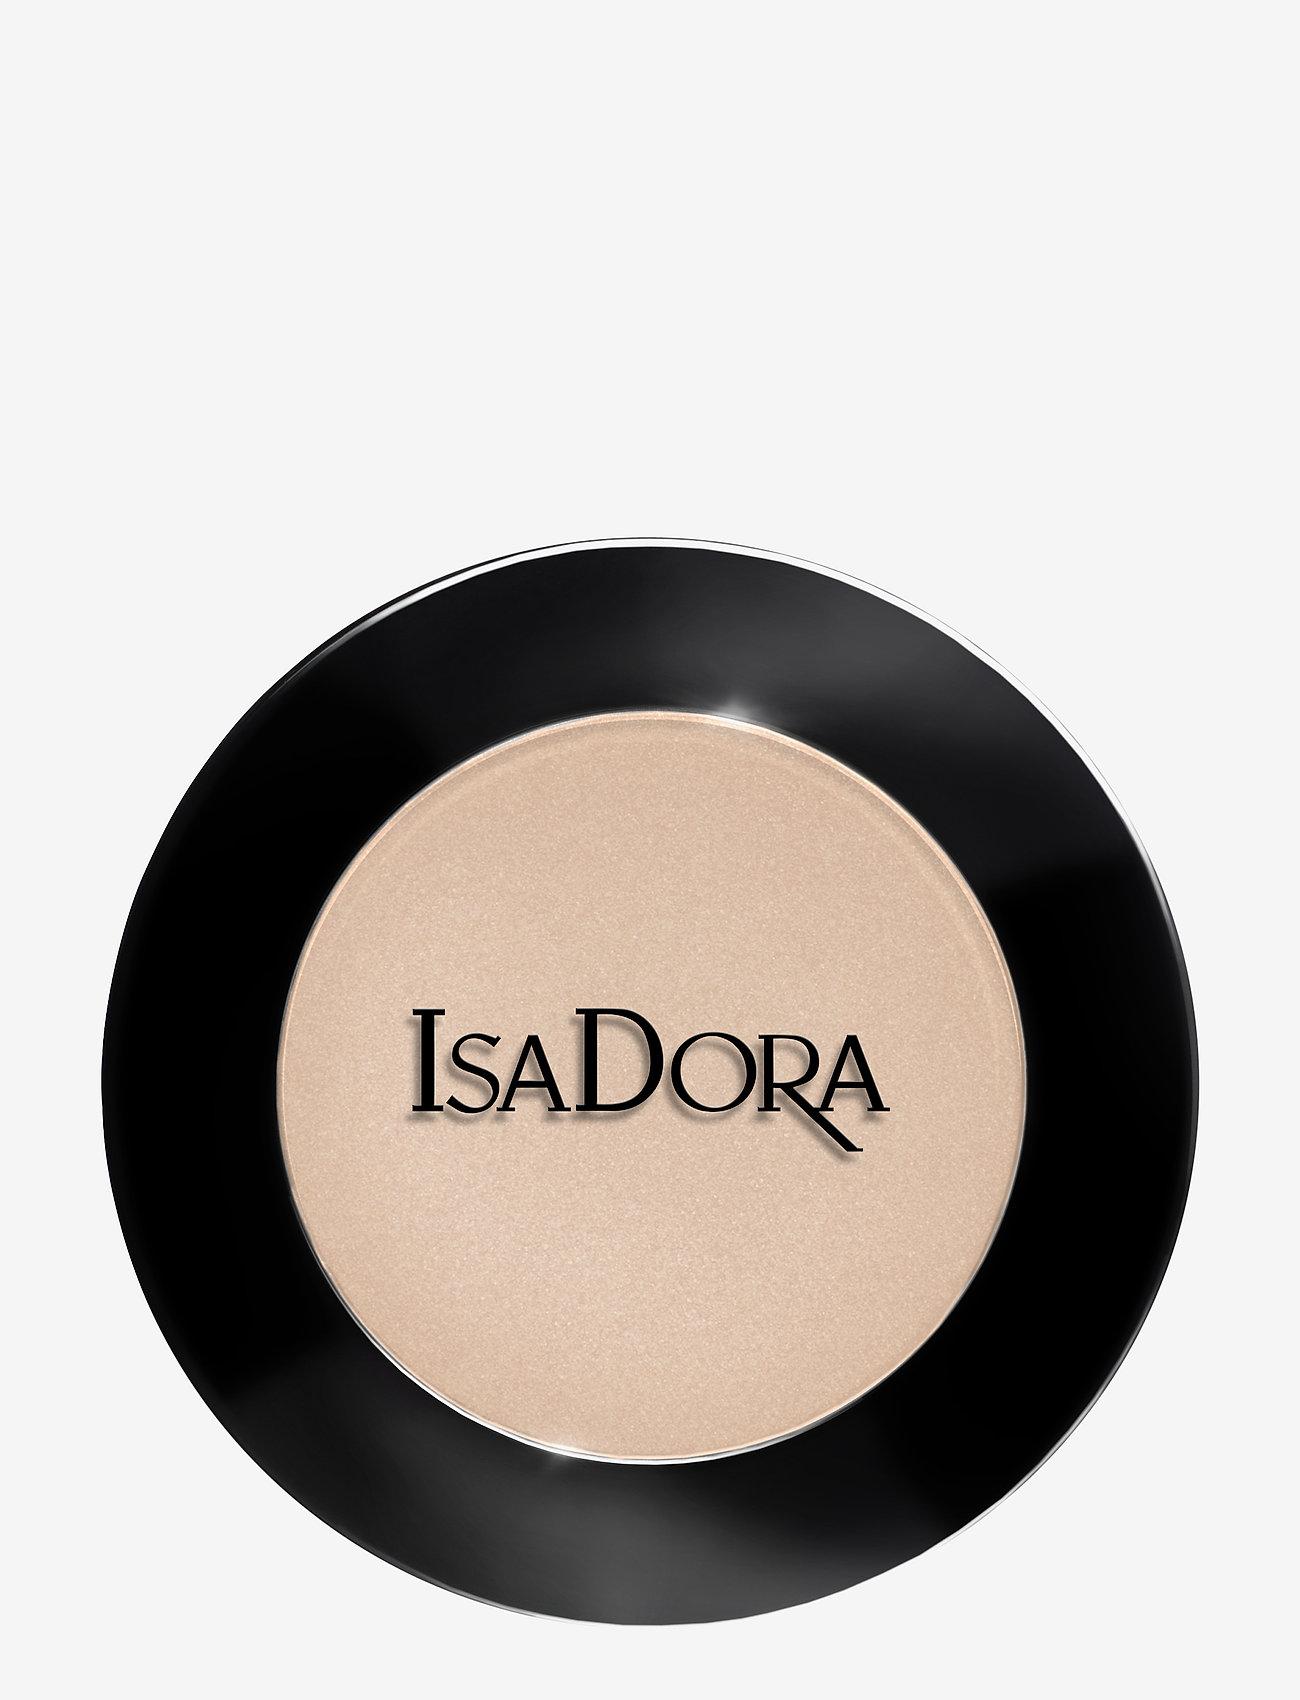 Isadora - PERFECT EYES 22 BARE BEIGE - Ögonskugga - 322 bare beige - 0